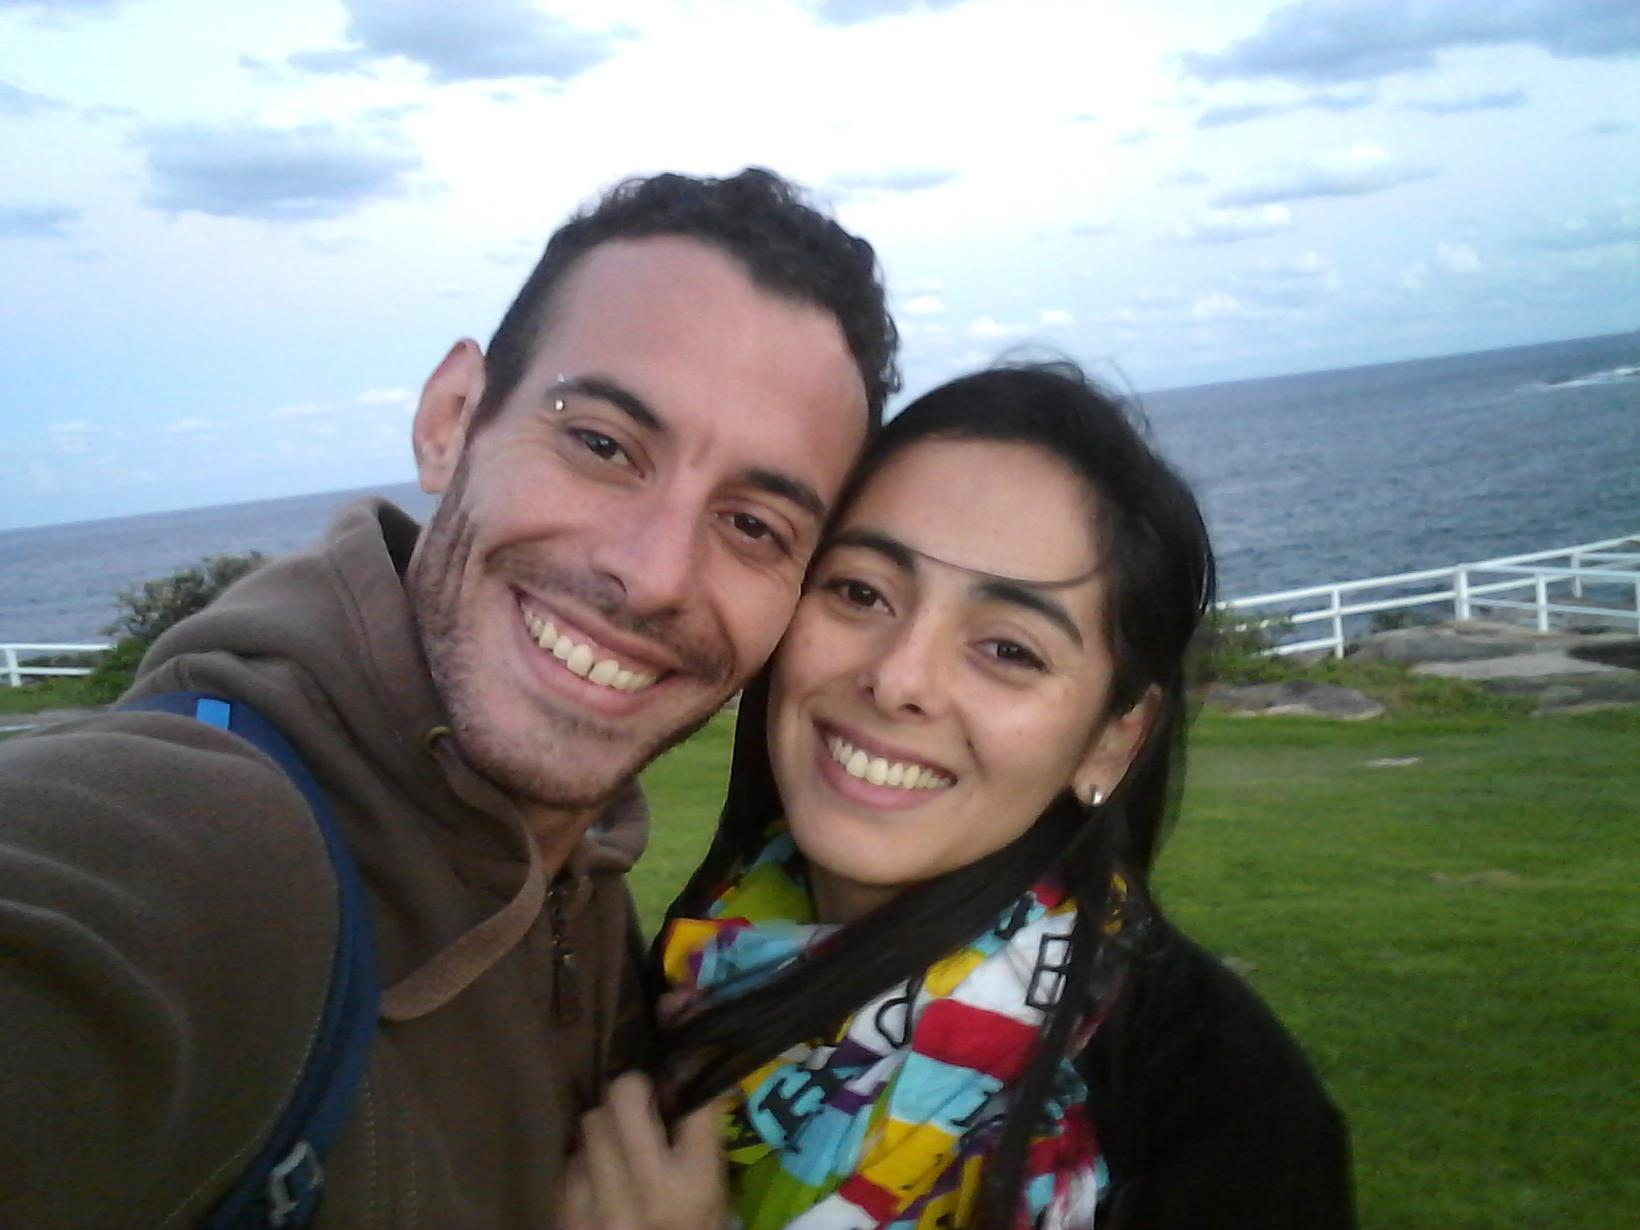 Nerina & Jeremias from Sydney, New South Wales, Australia